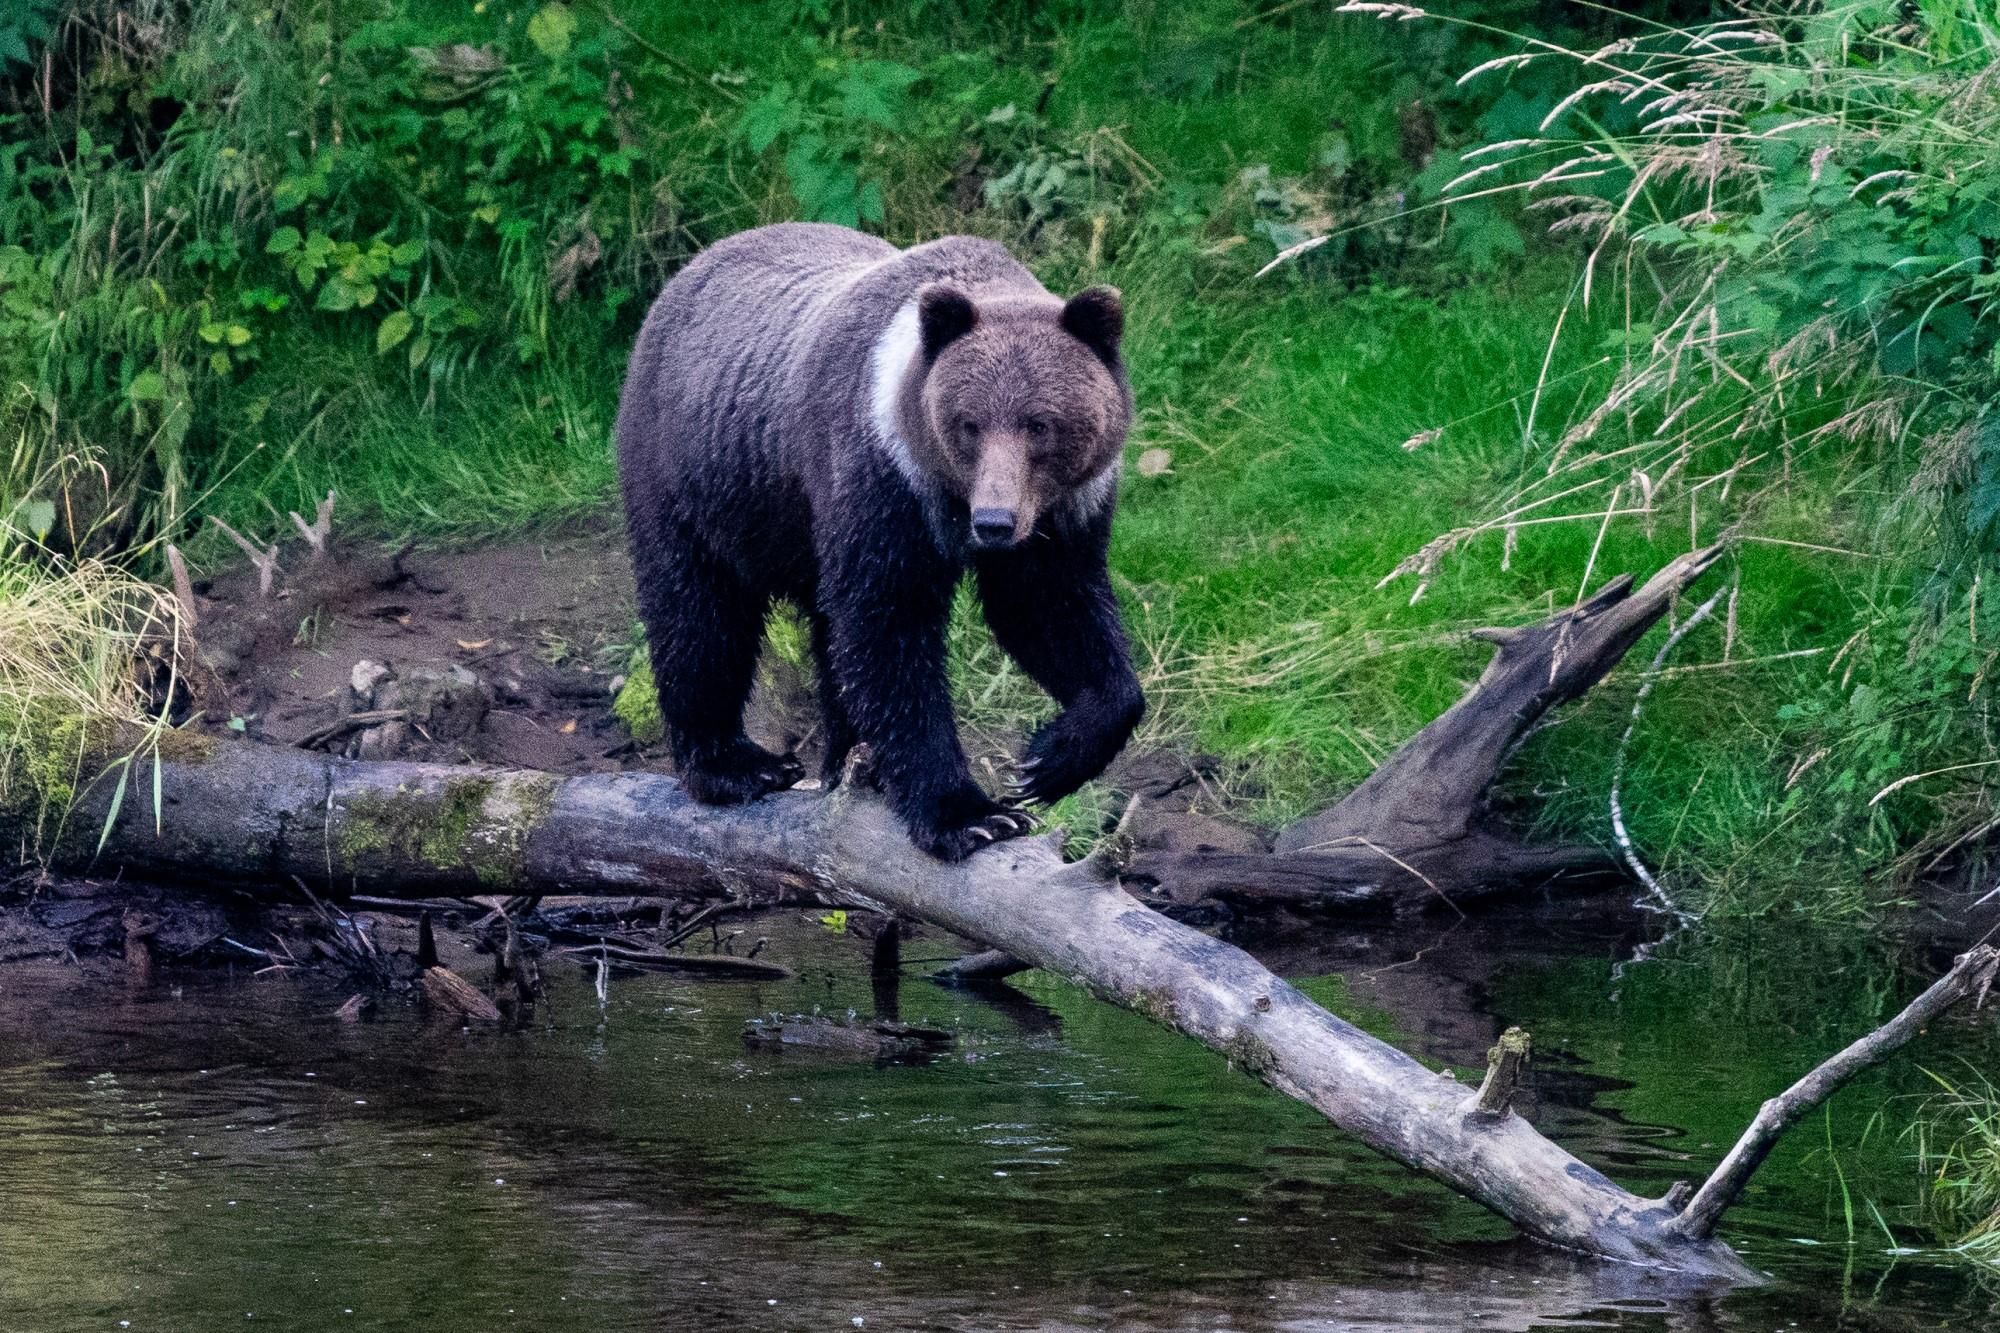 Black bear crossing a stream